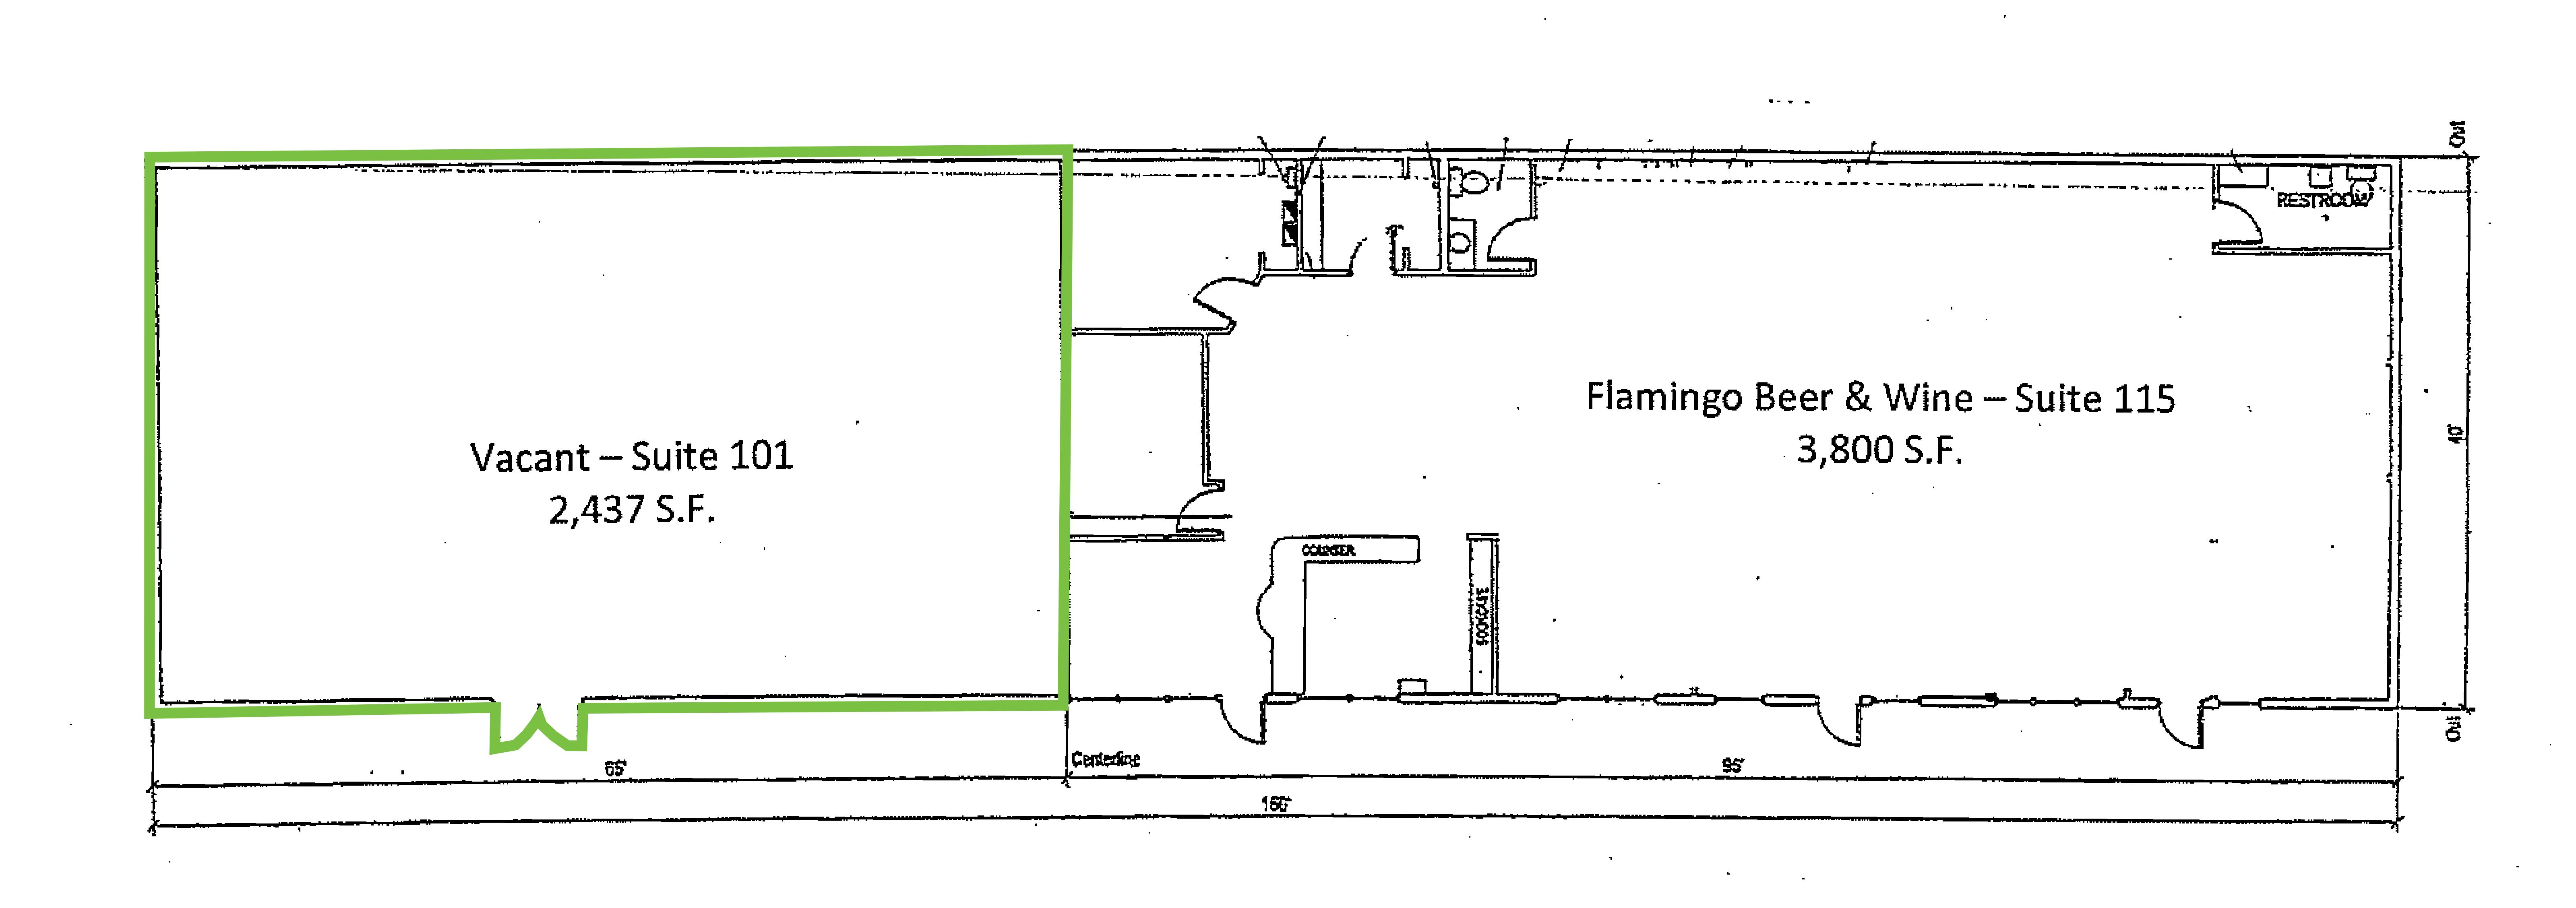 Davenport Shopping Center: site plan